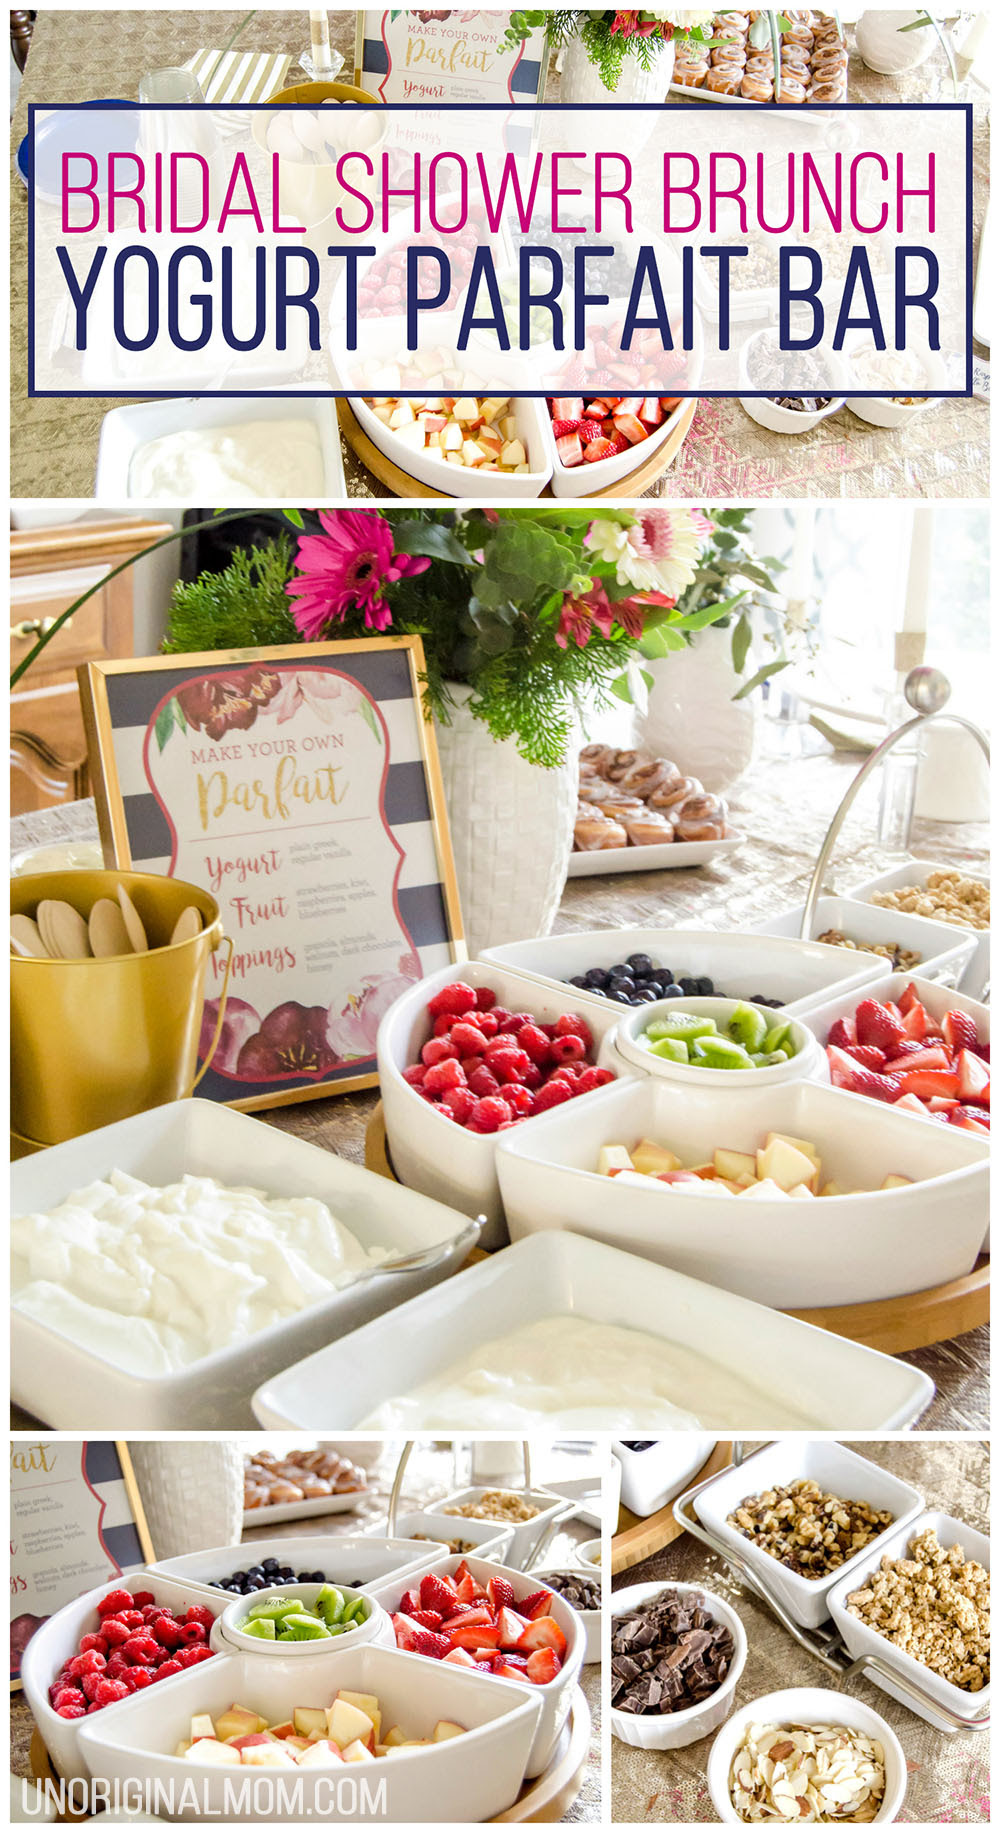 Bridal Shower Brunch Yogurt Parfait Bar Unoriginal Mom